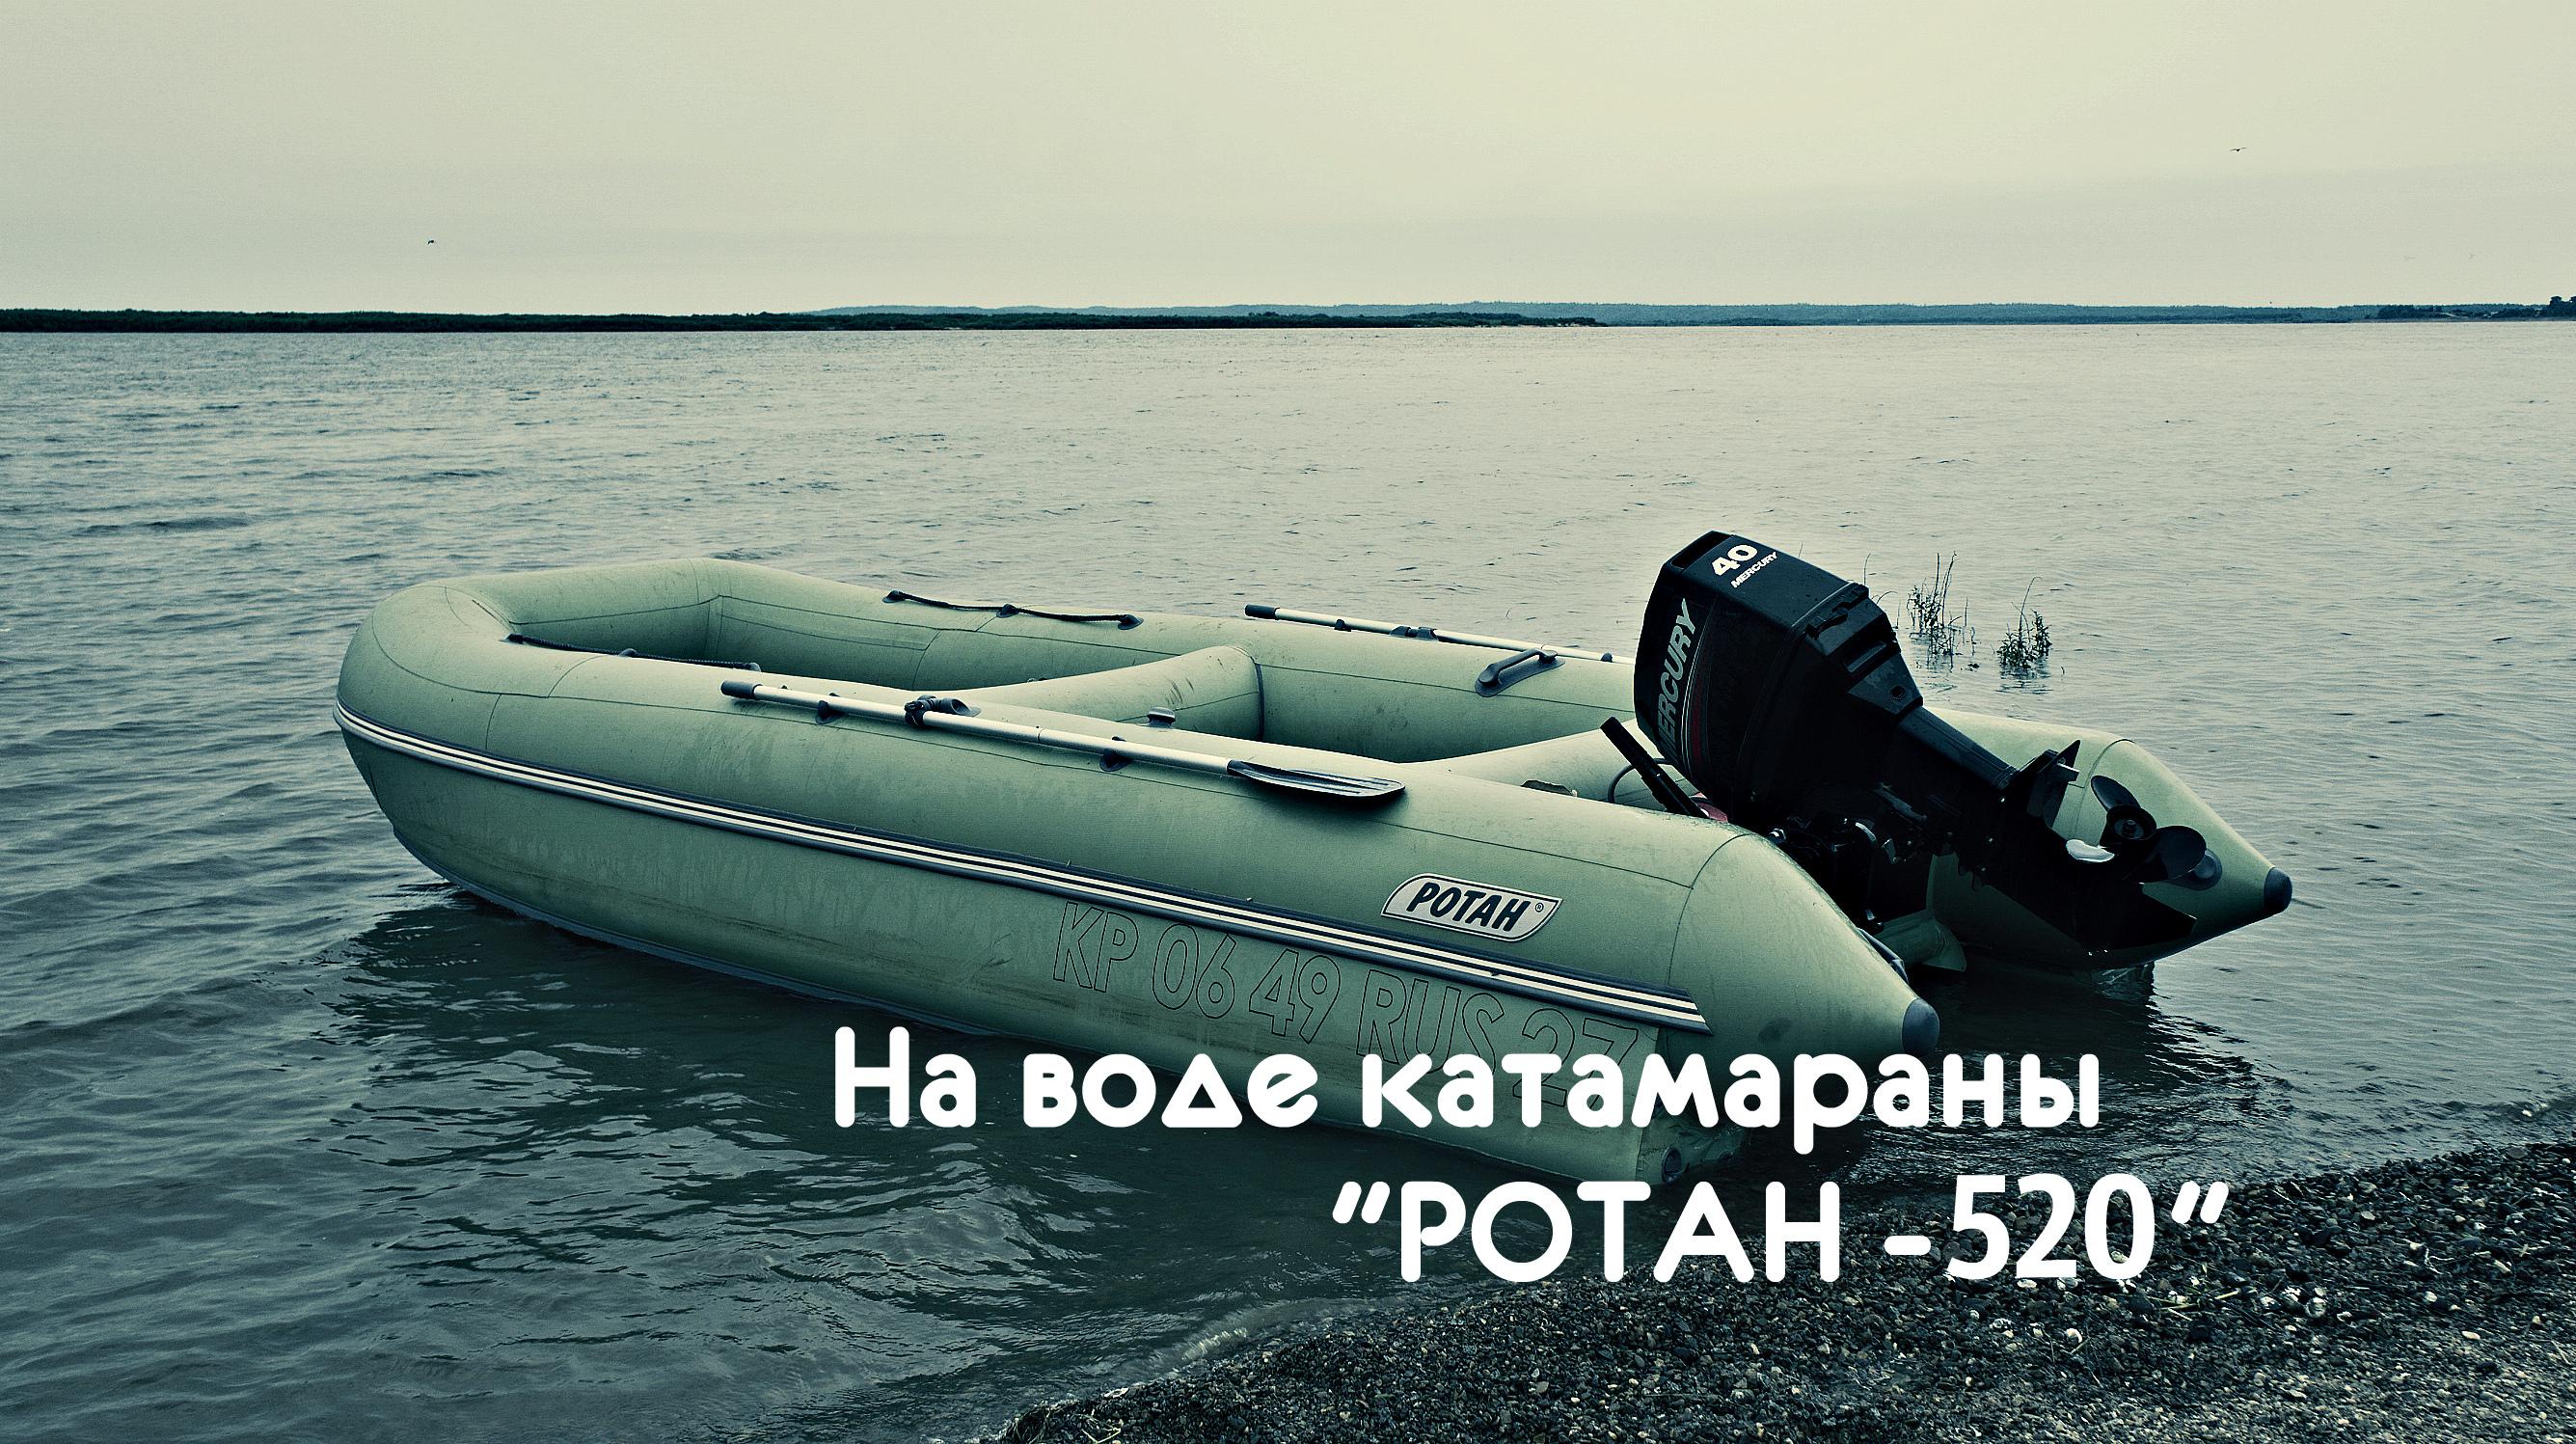 ротан-09